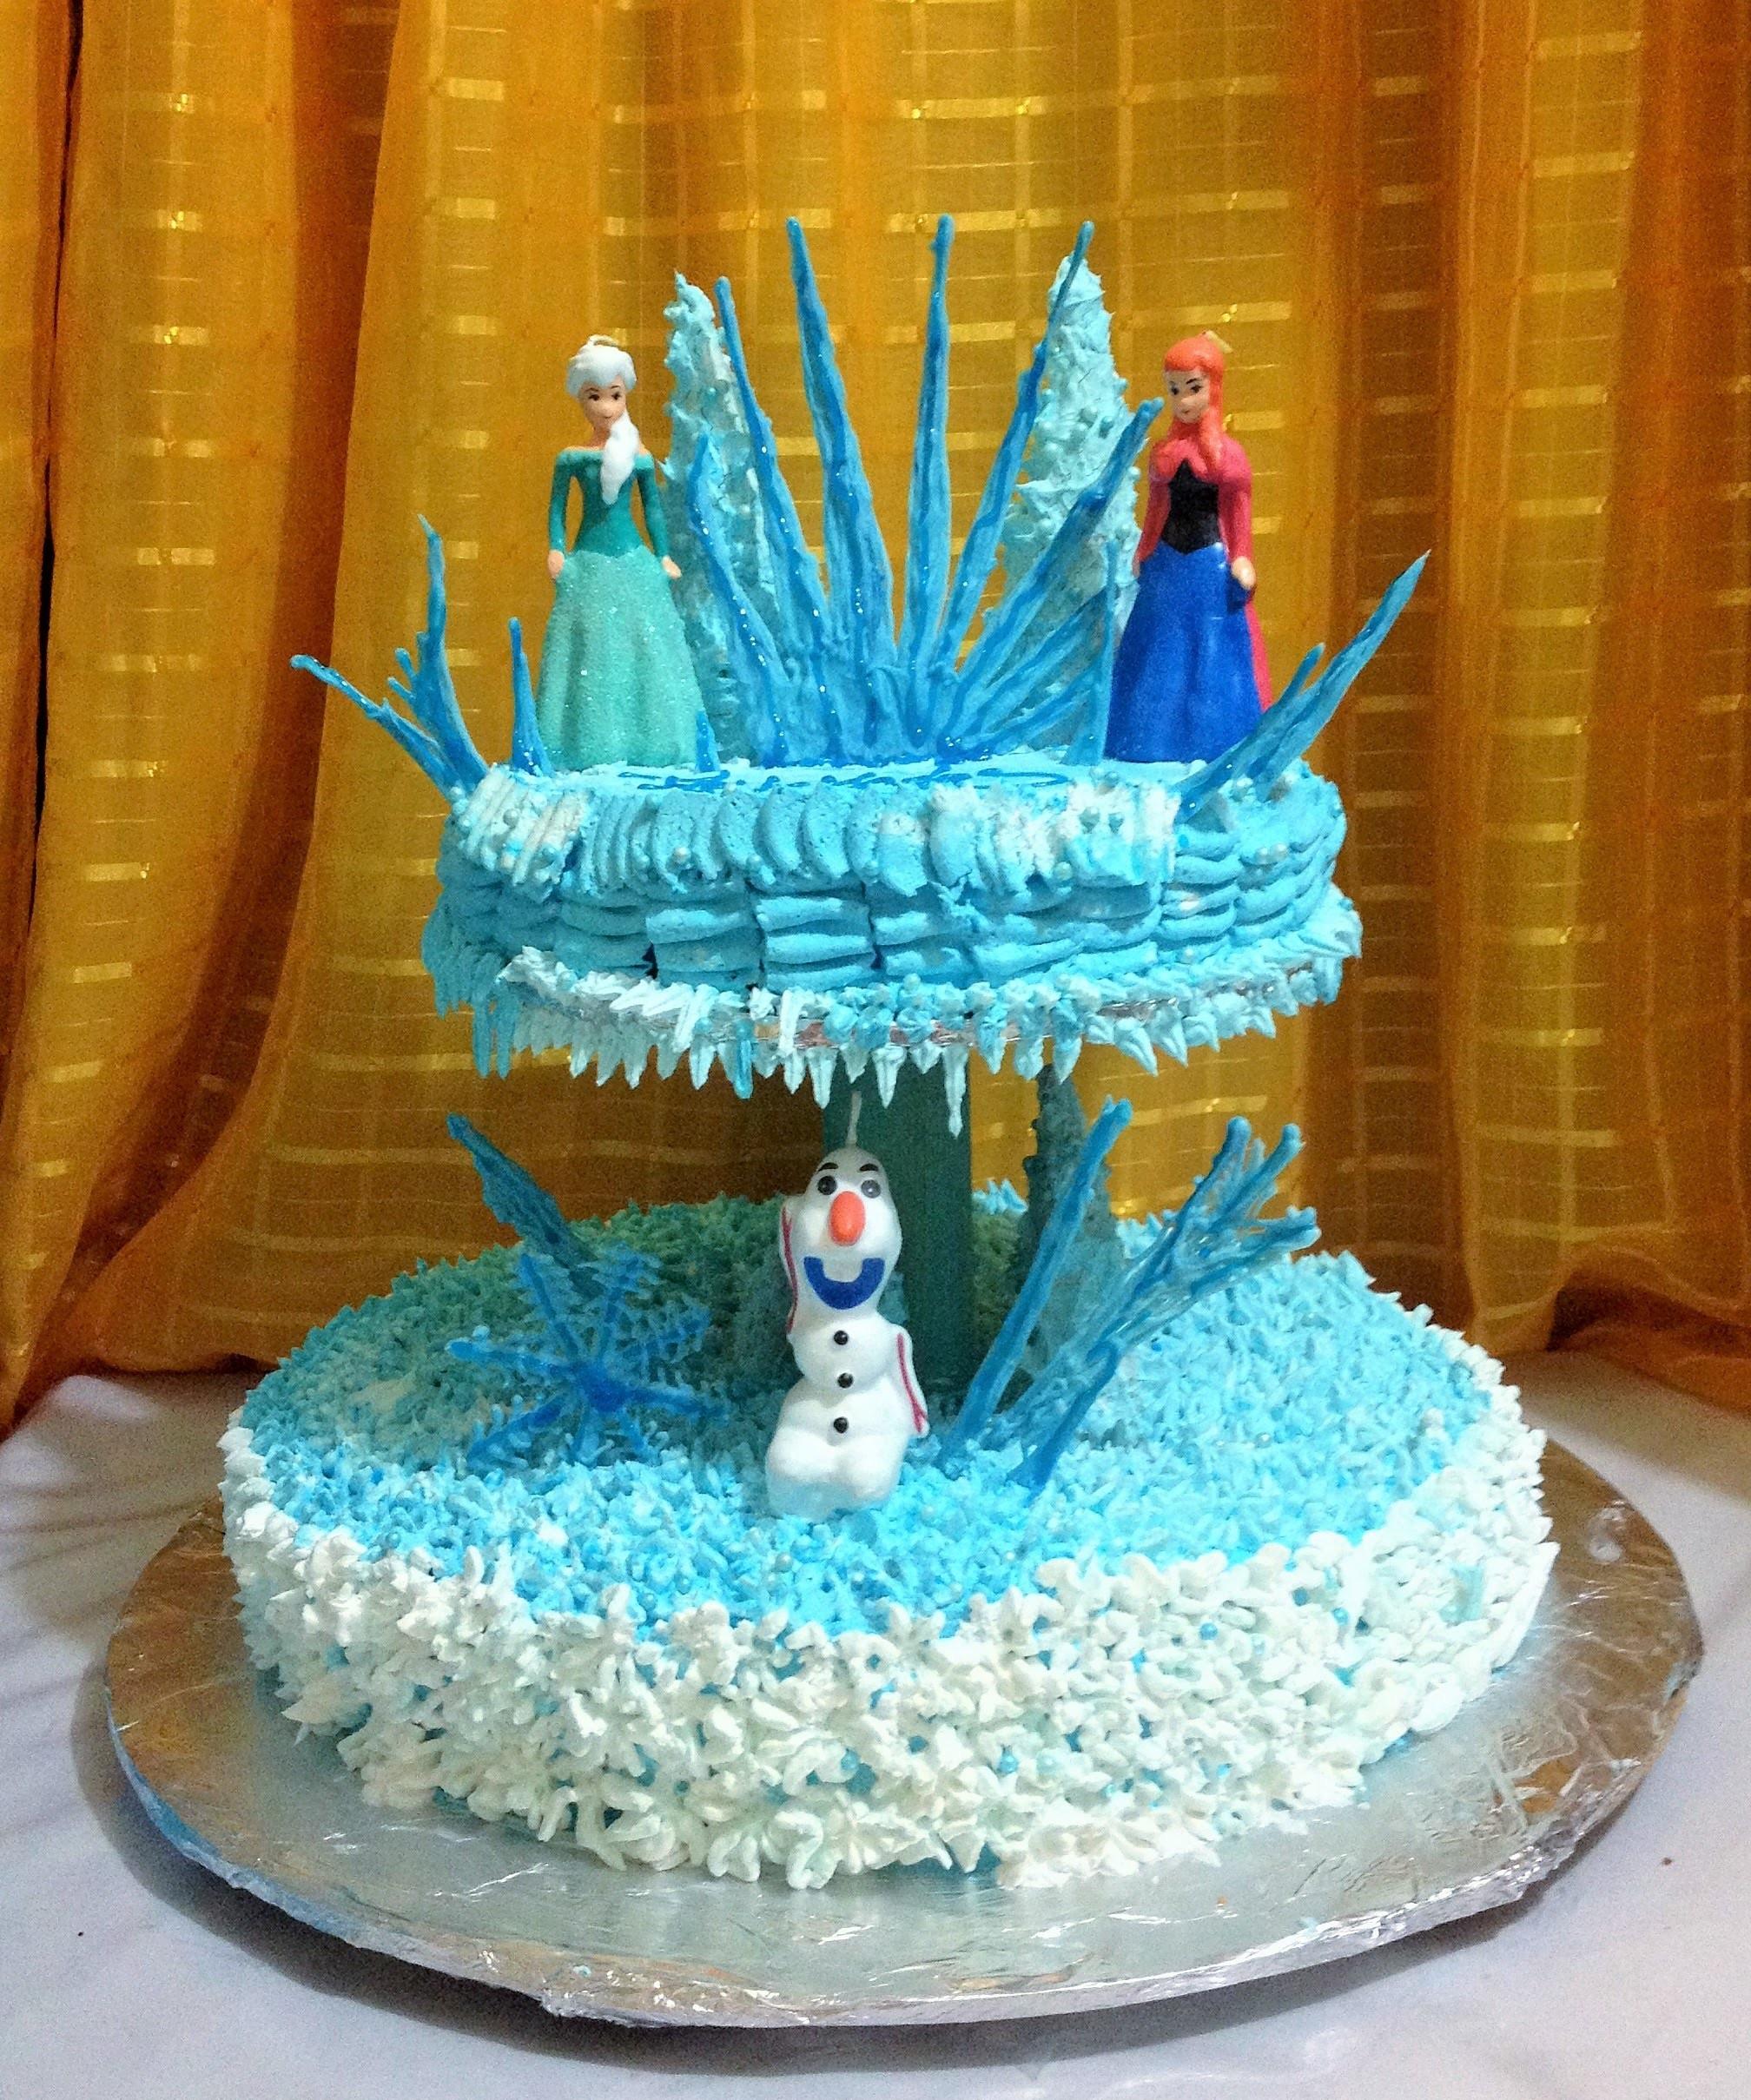 DIY Decora pastel de FROZEN,DECORATE CAKE FROZEN  , TORTA chantilly facil